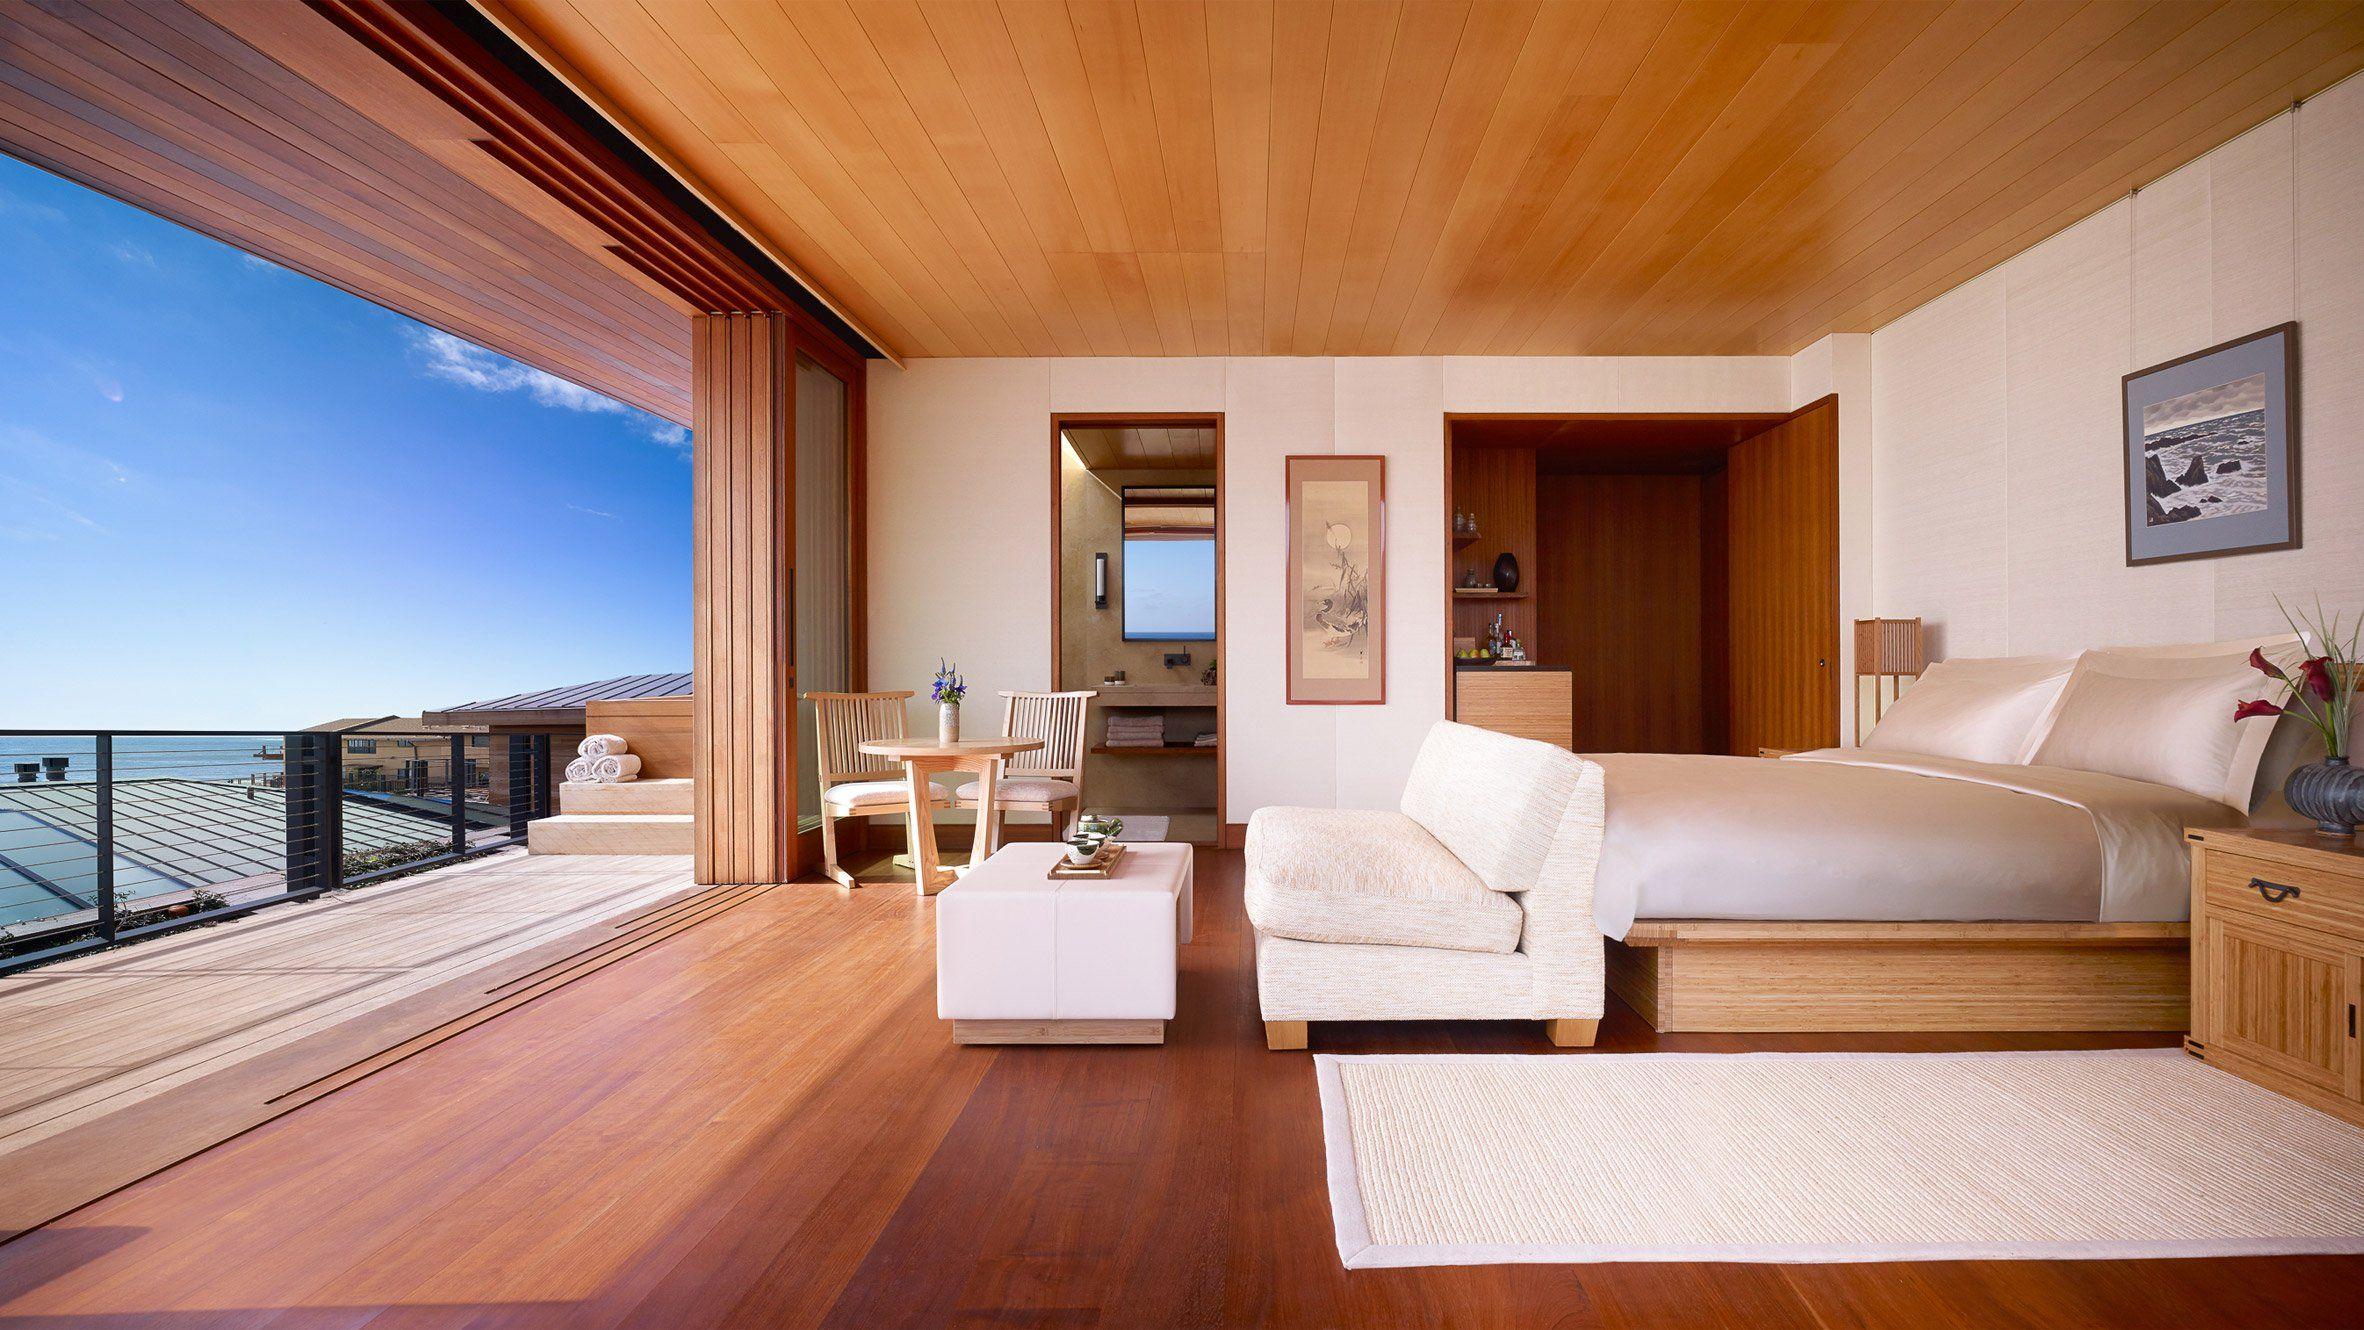 Studio Pch And Montalba Architects Converted A 1950s Beachfront Hotel Into U Ryokan Malibu The